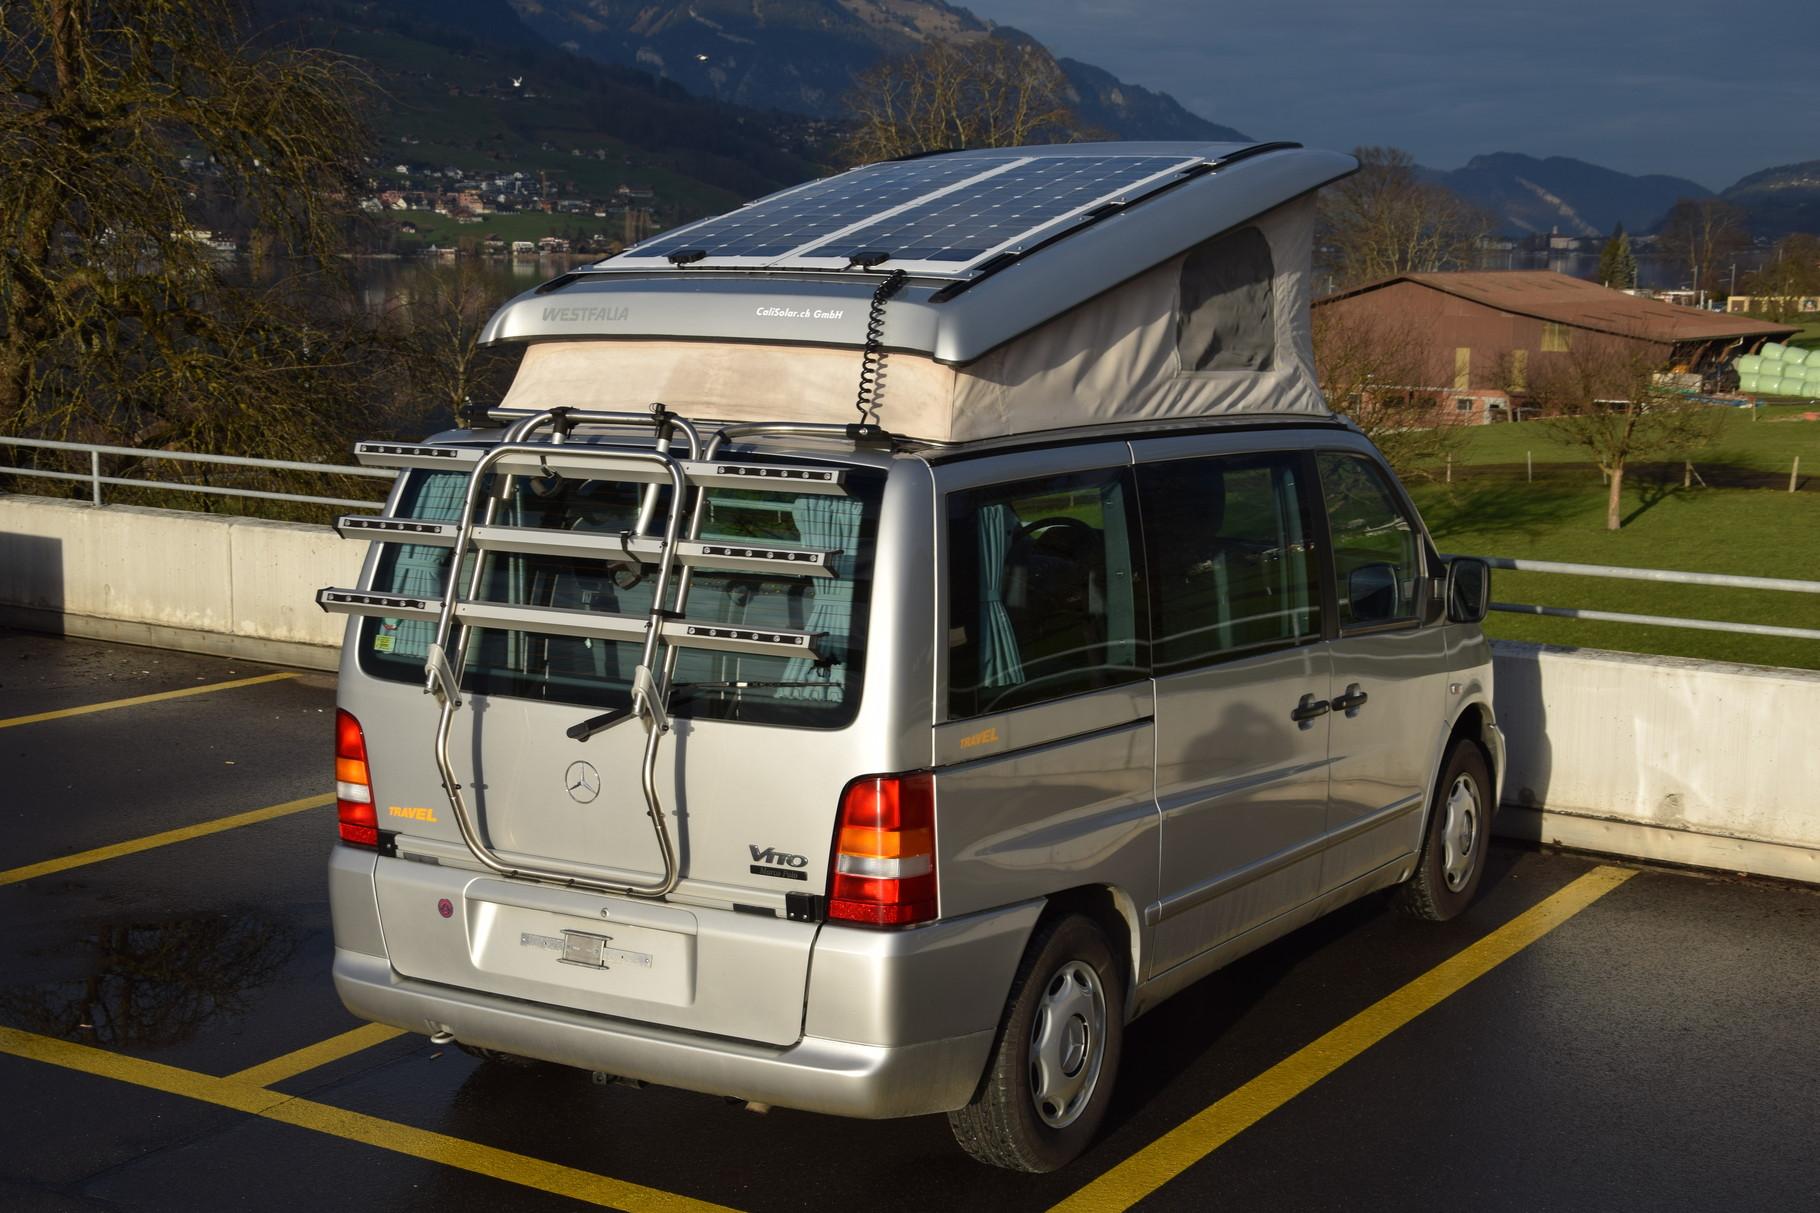 camper westfalia mercedes vito marco polo mercedes vito. Black Bedroom Furniture Sets. Home Design Ideas